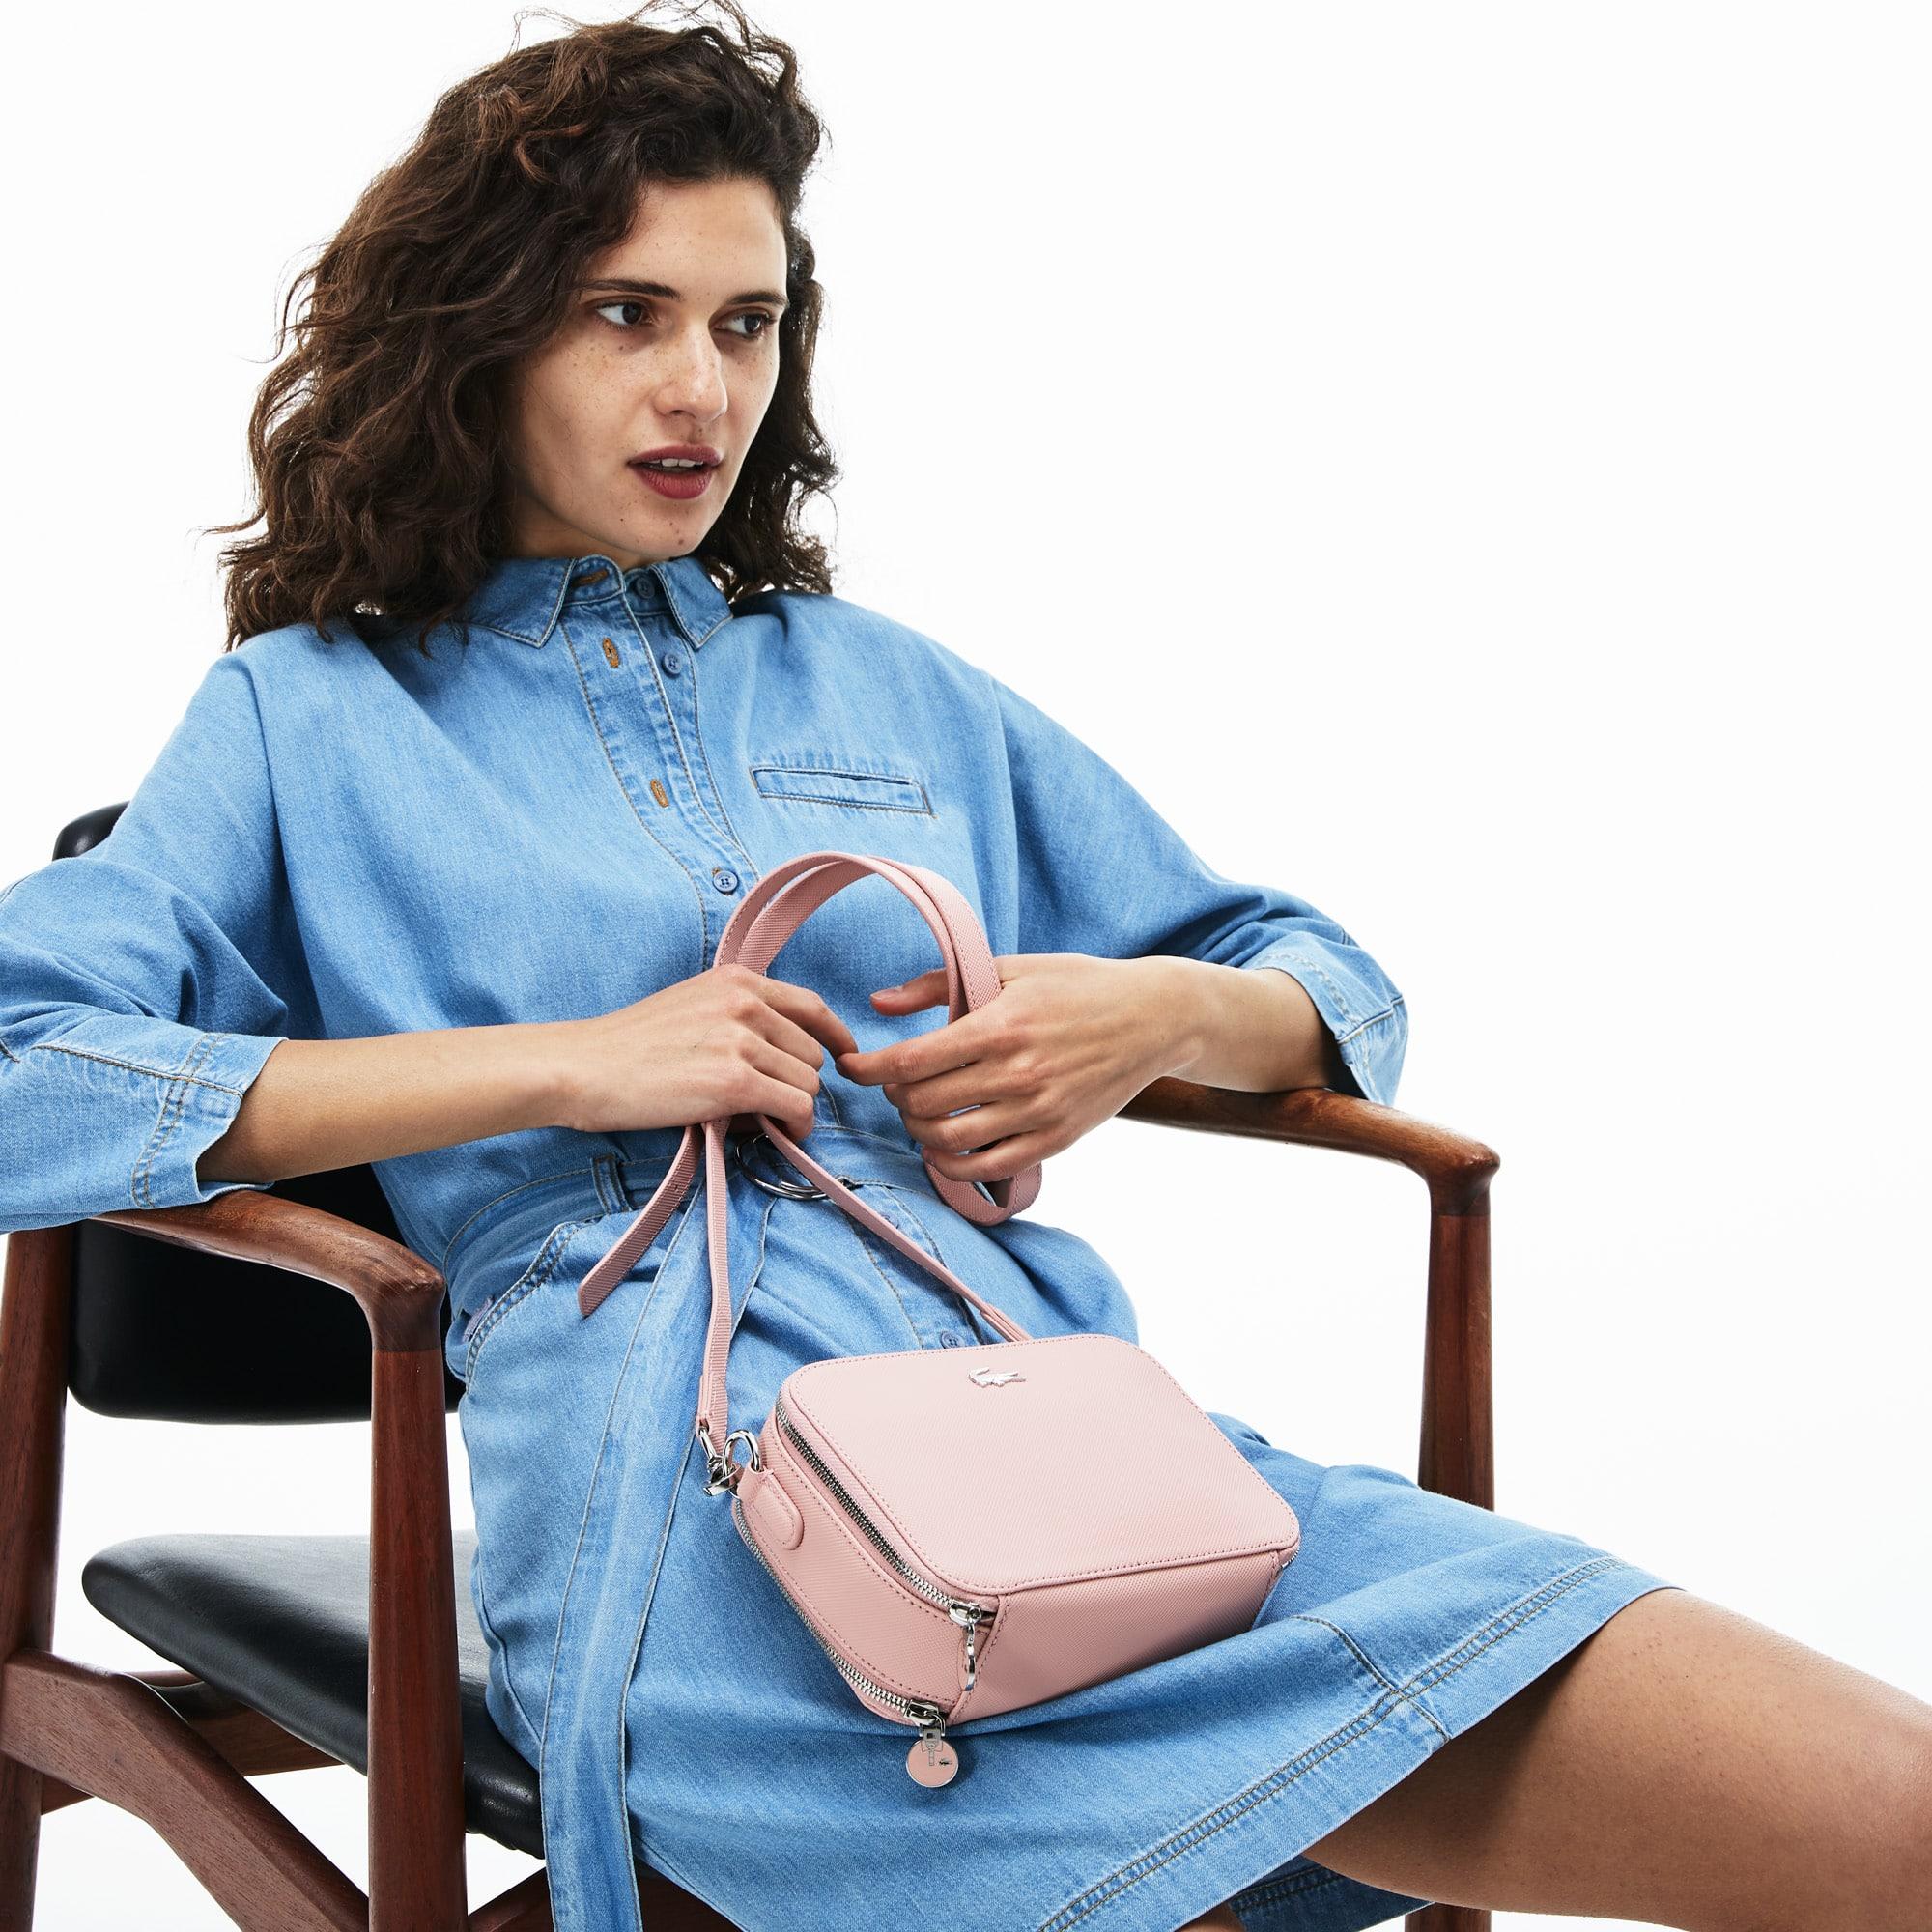 f9266521b8cb9 وصل حديثاً. حقيبة كتف نسائية بسحابين من الكنفا والبيكيه بتصميم كلاسيكي  لإطلالة يومية أنيقة